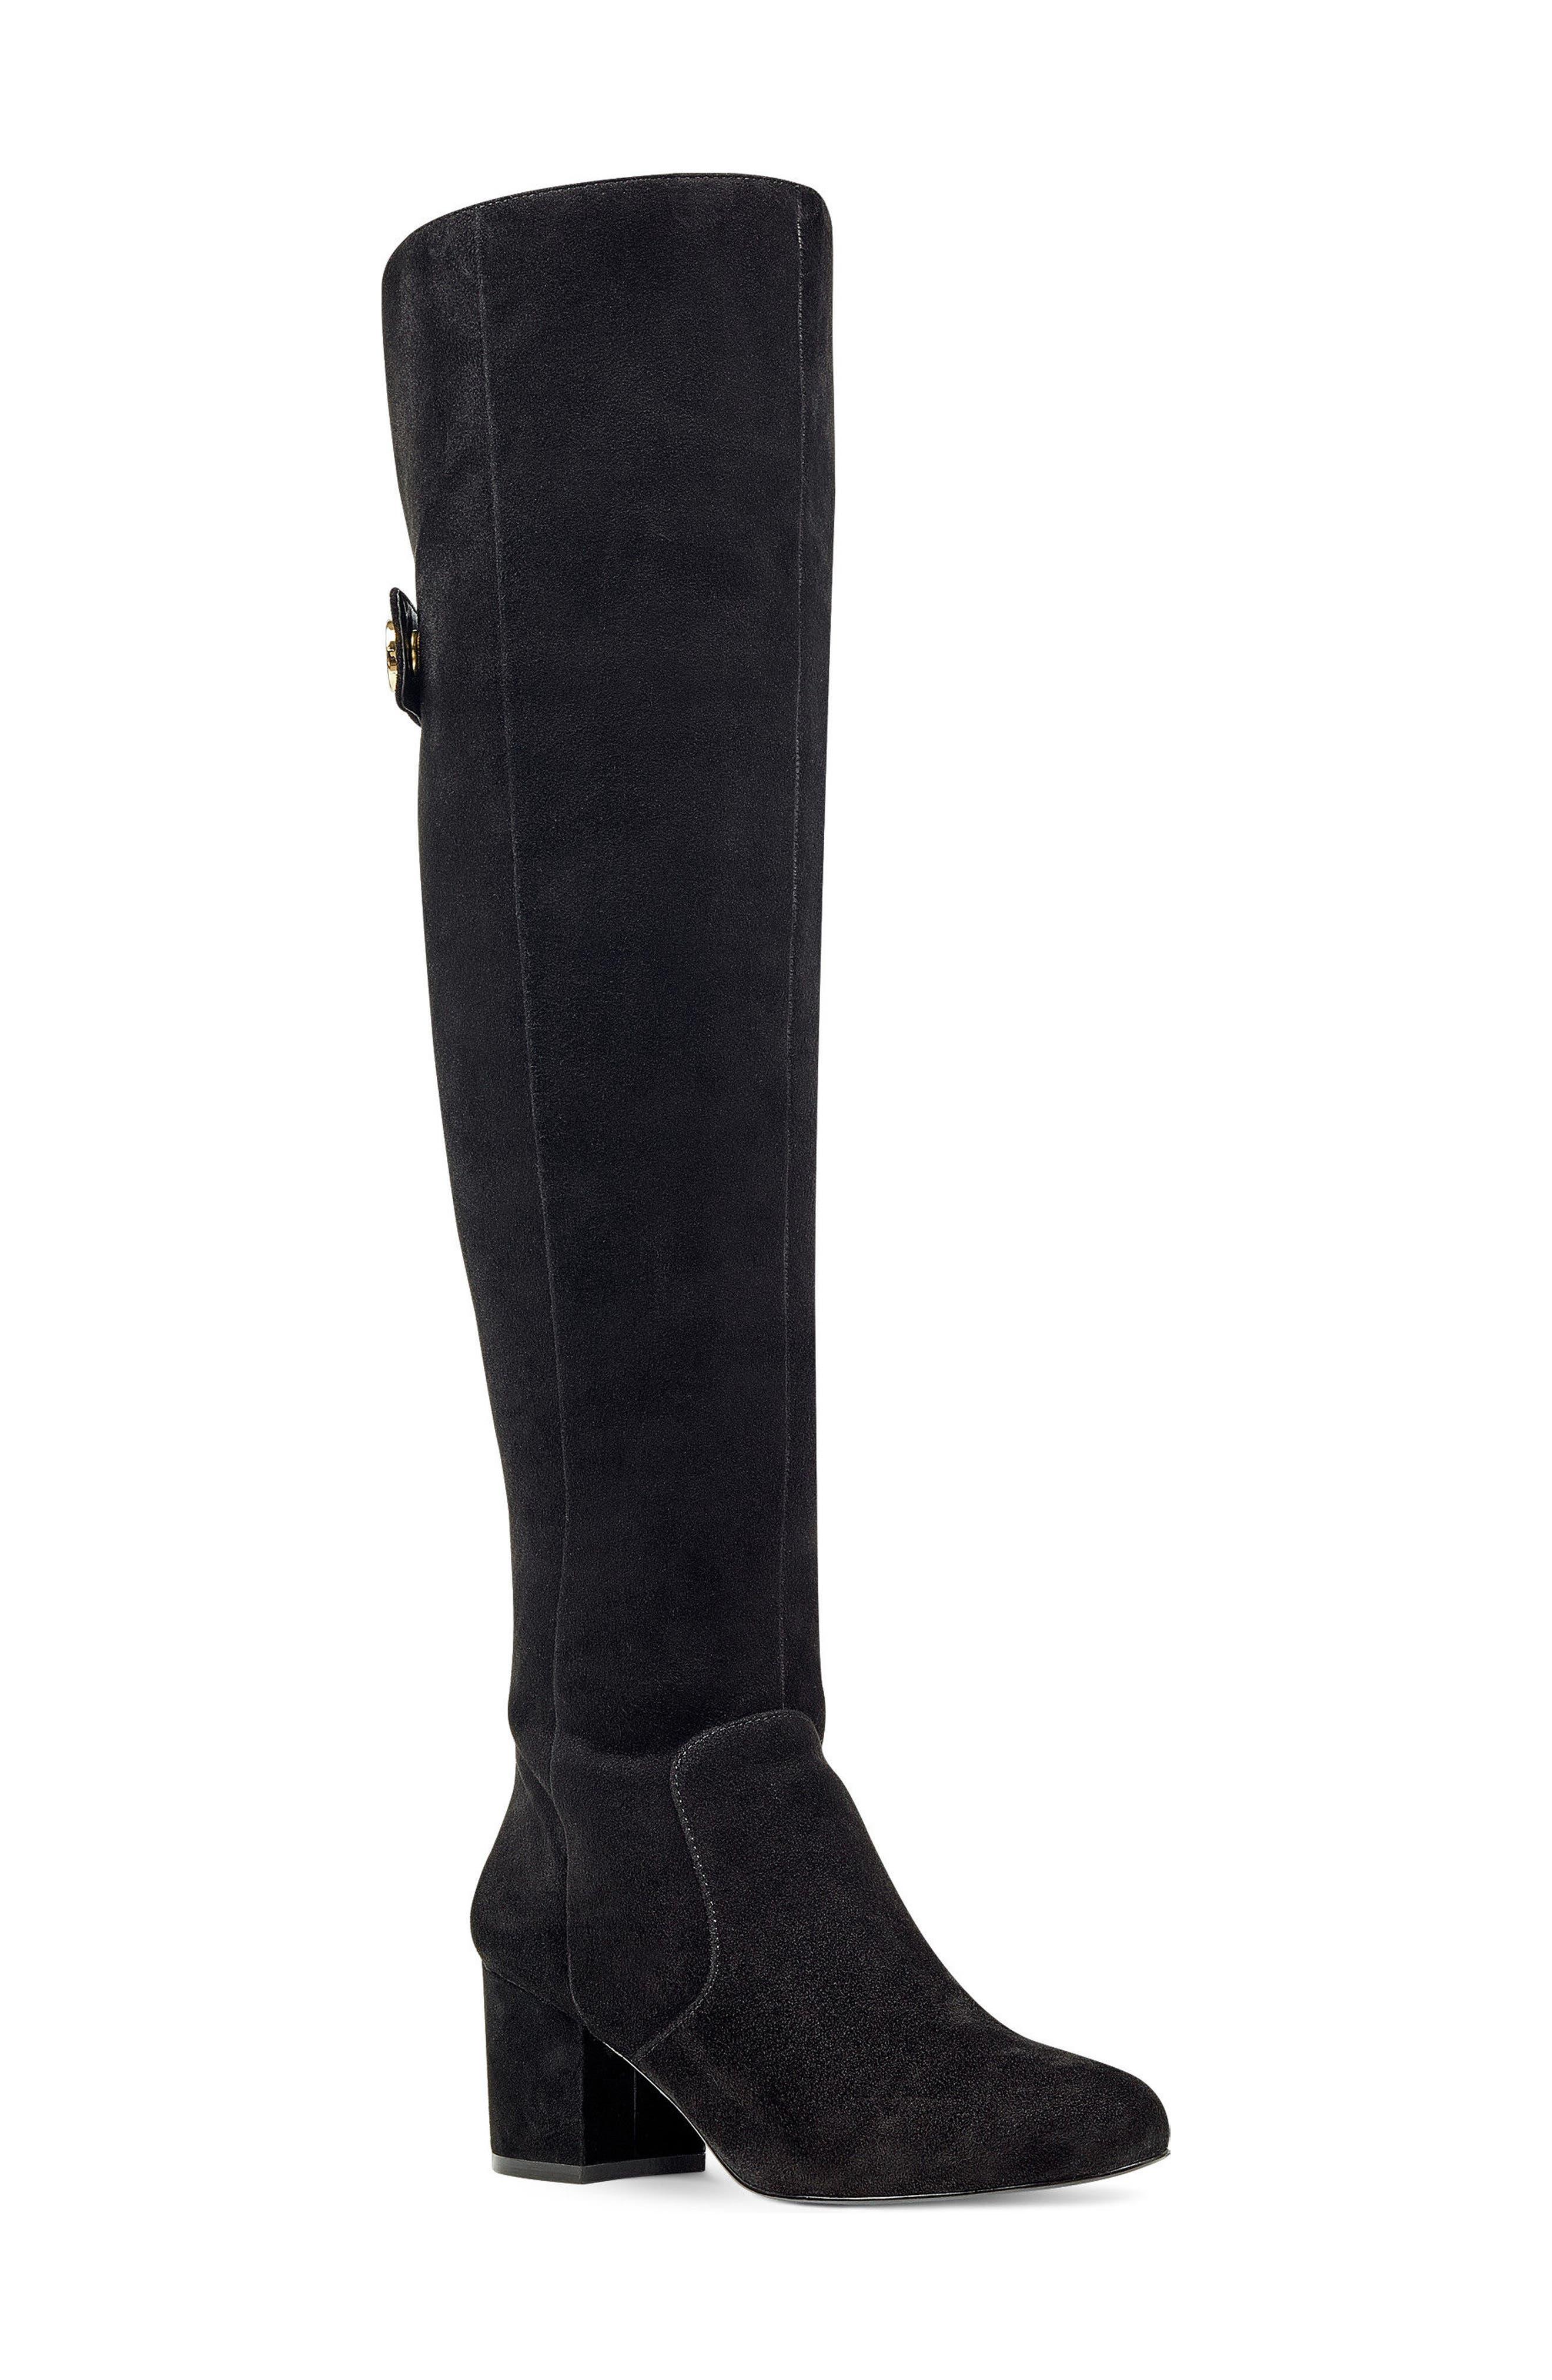 Main Image - Nine West Queddy Over the Knee Boot (Women)